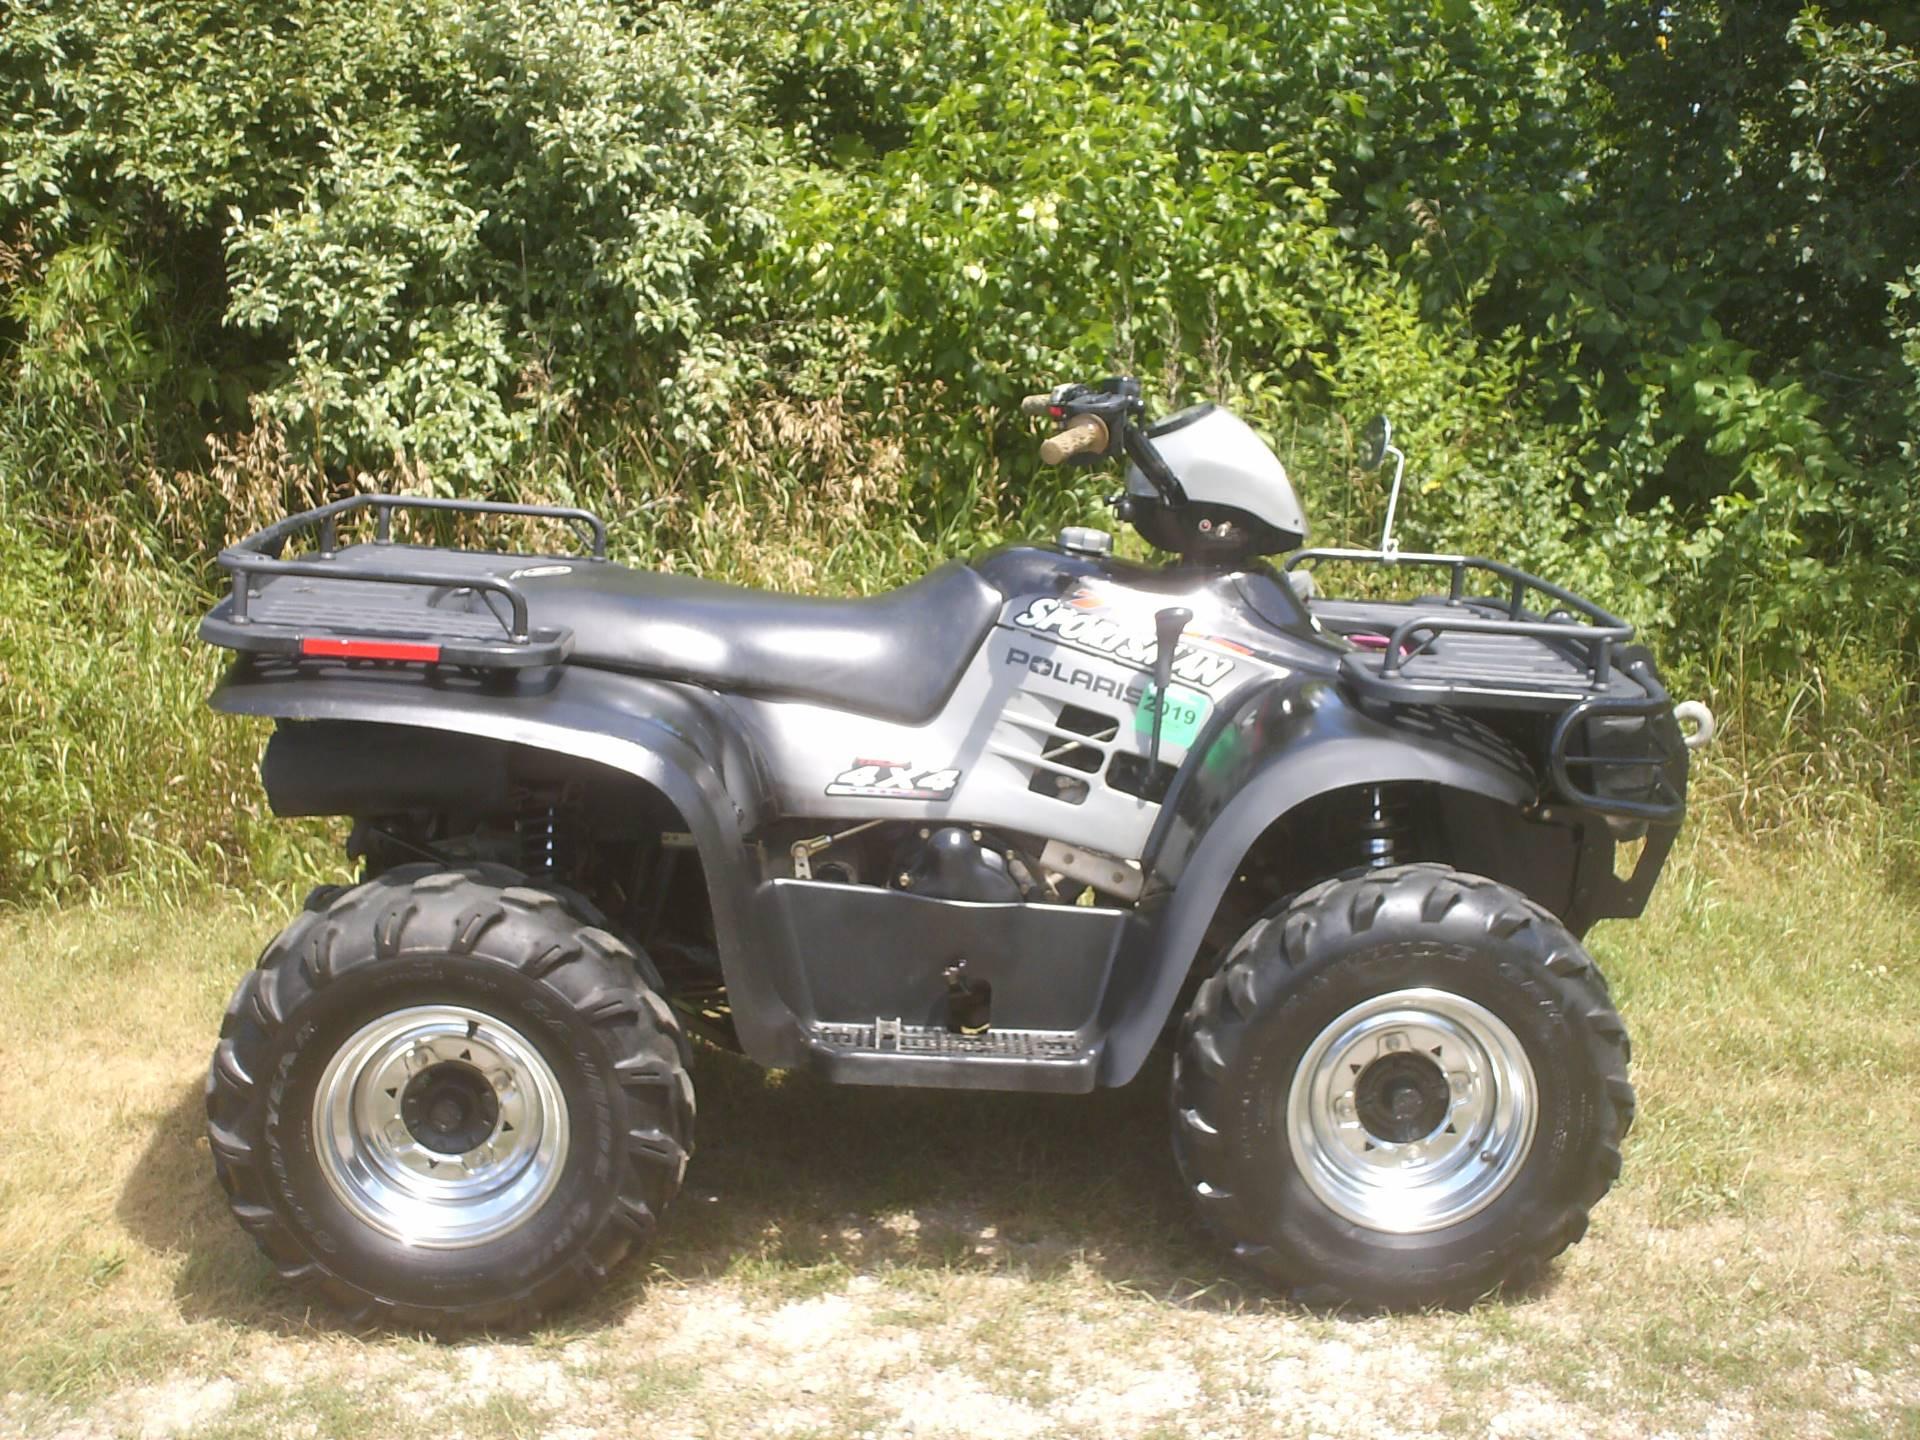 2002 Polaris Sportsman 700 Twin ATVs Mukwonago Wisconsin